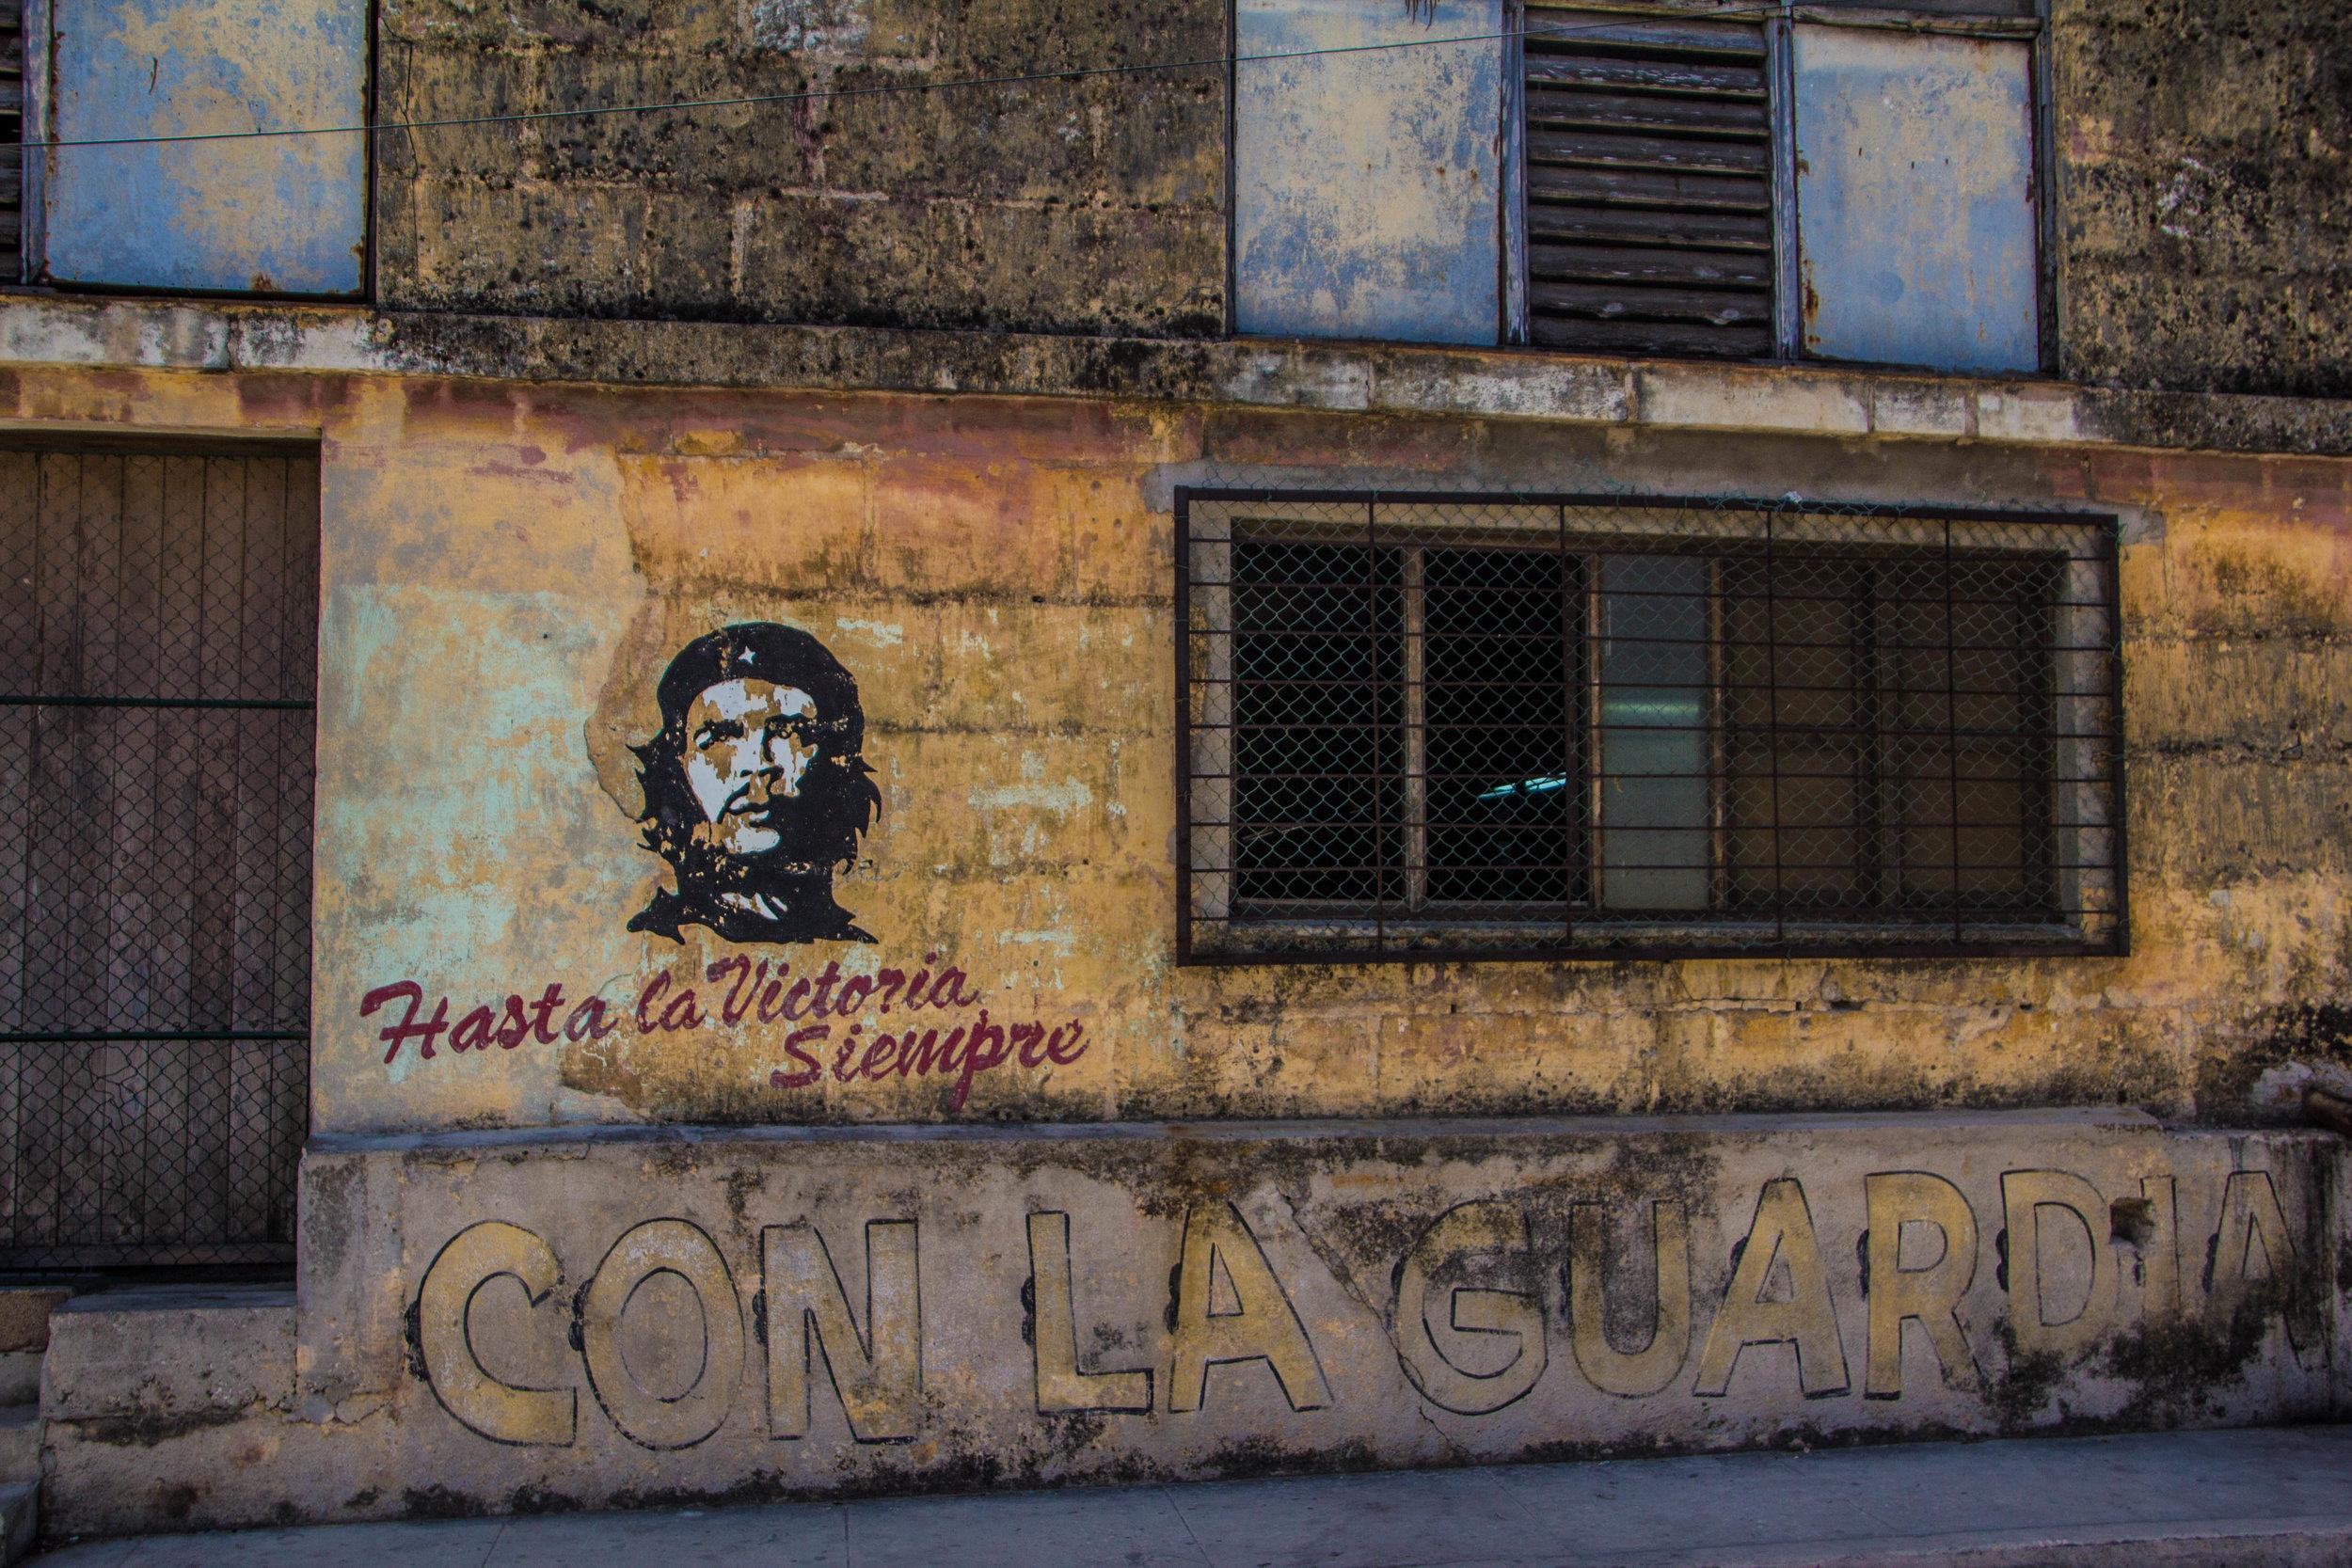 che guavera street art matanzas cuba-1-2.jpg